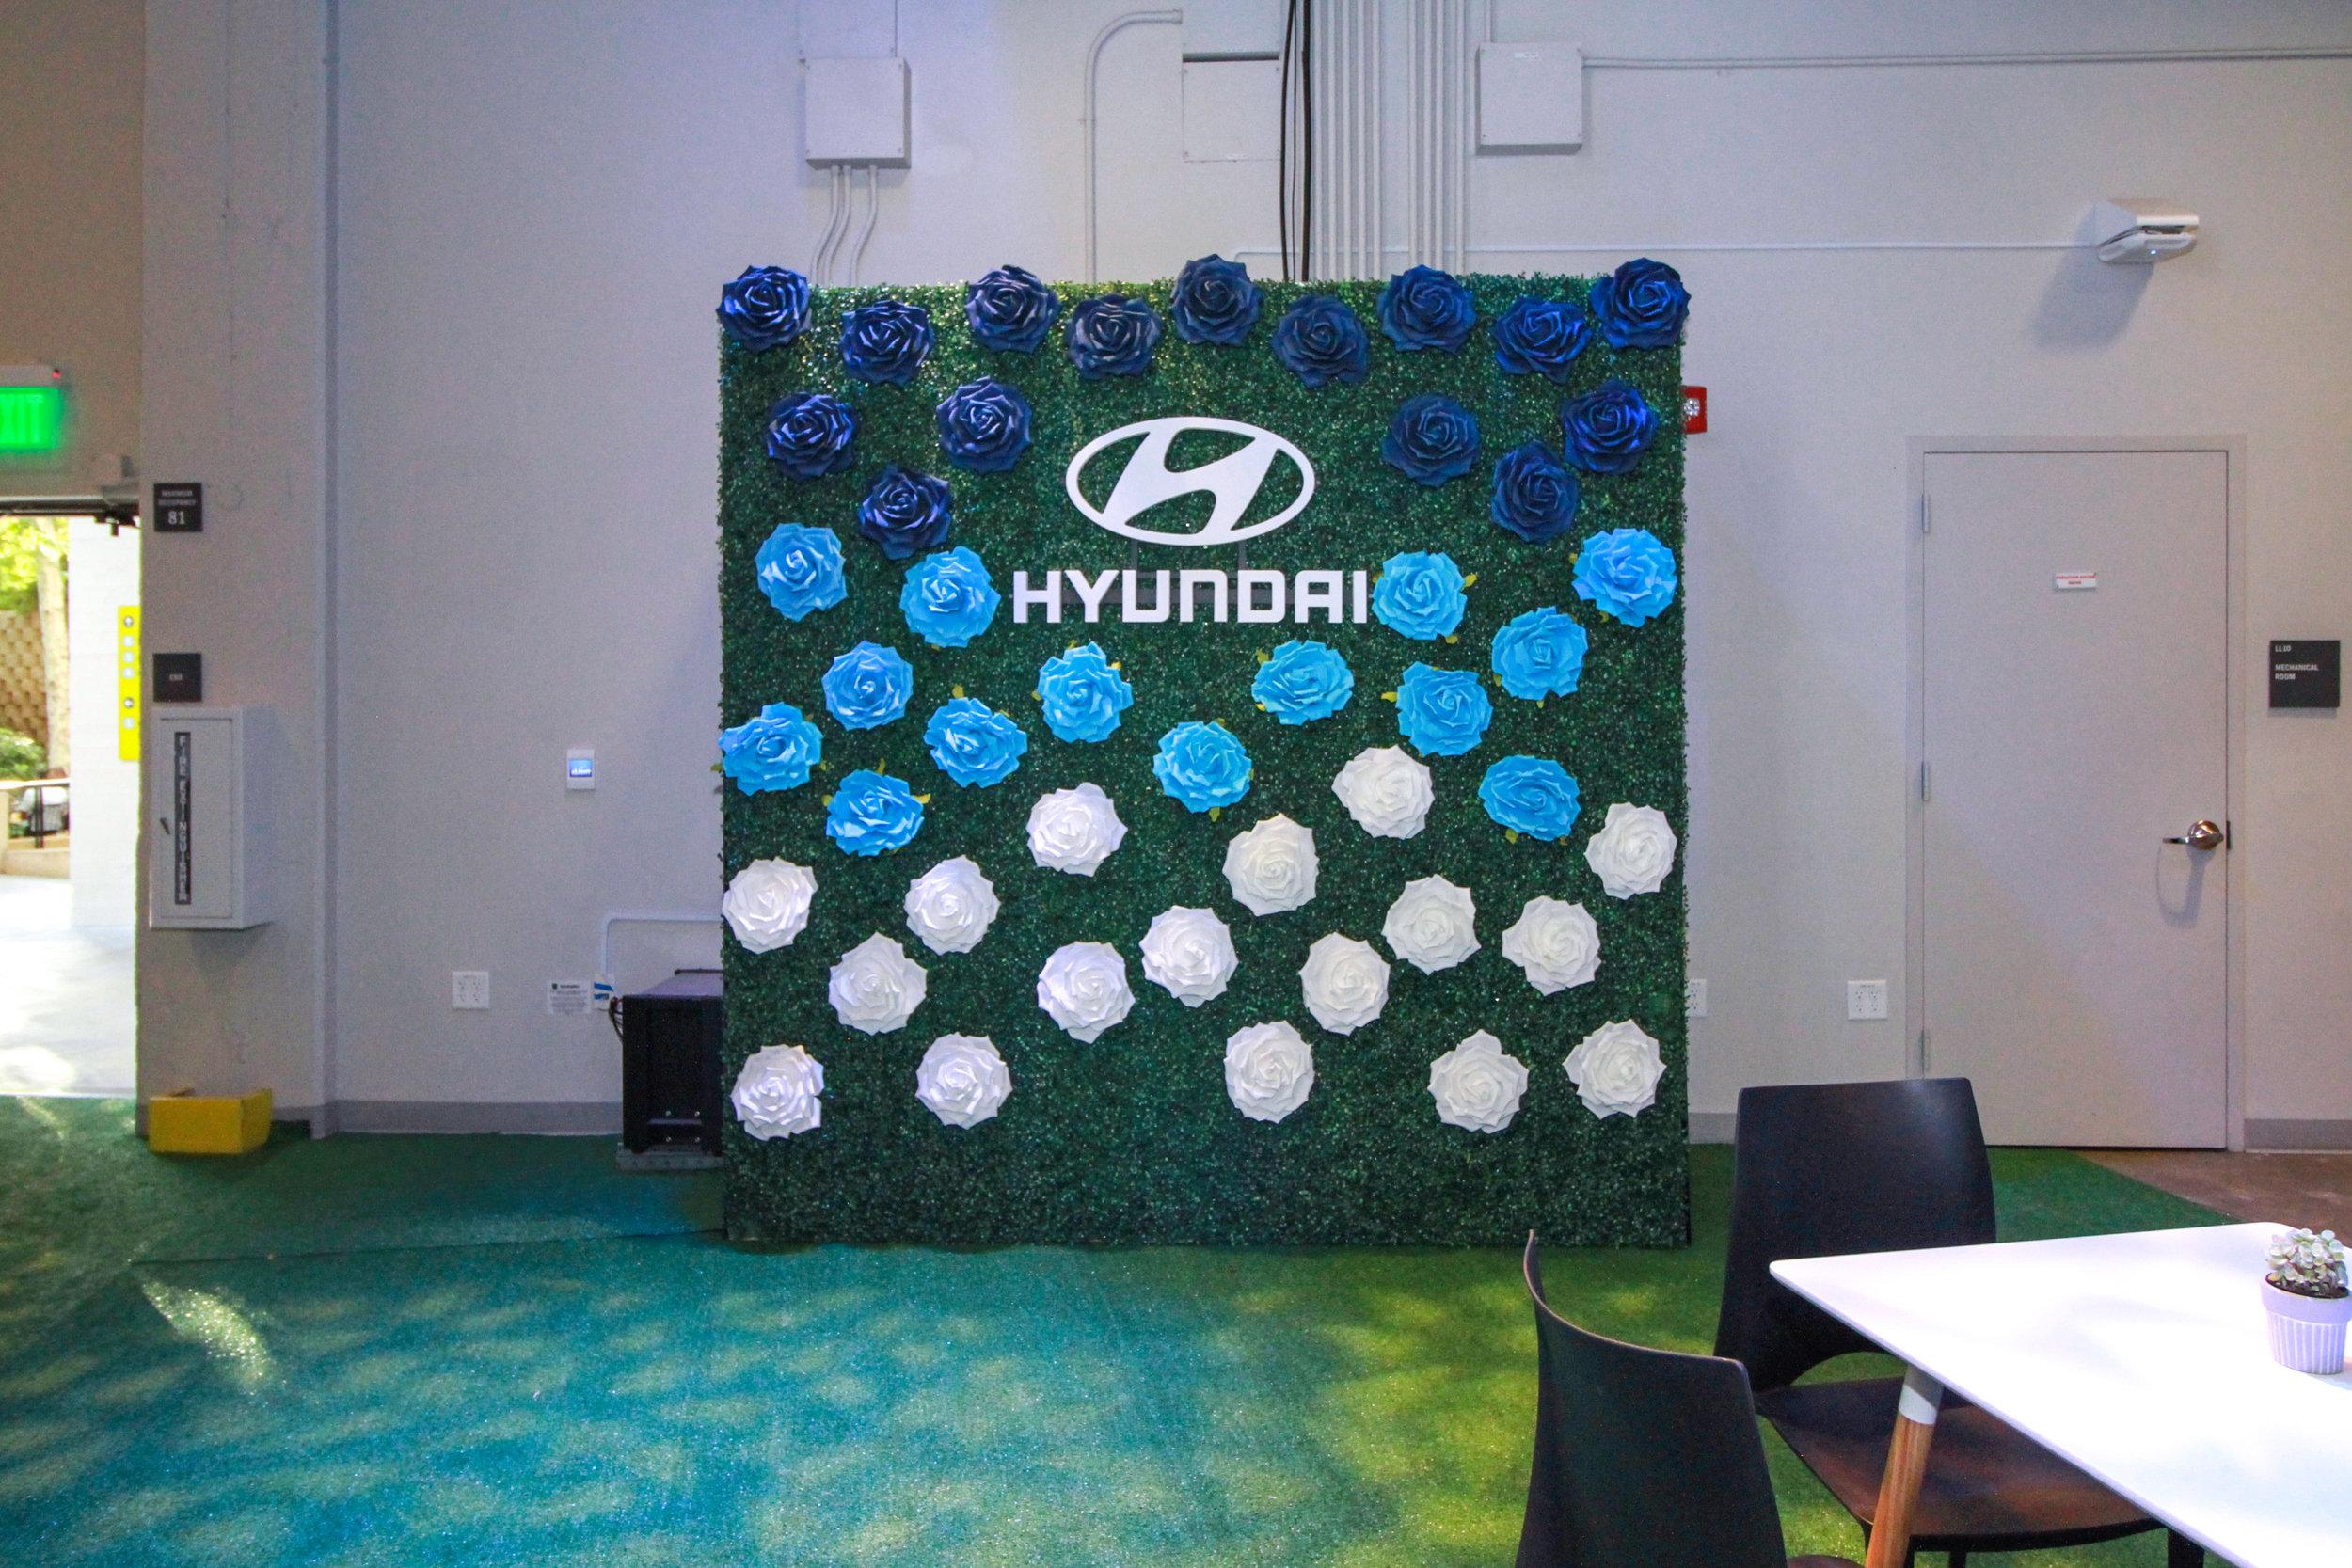 OHelloMedia-Hyundai-Outfest-LA-Environmental,Signage-3926.jpg